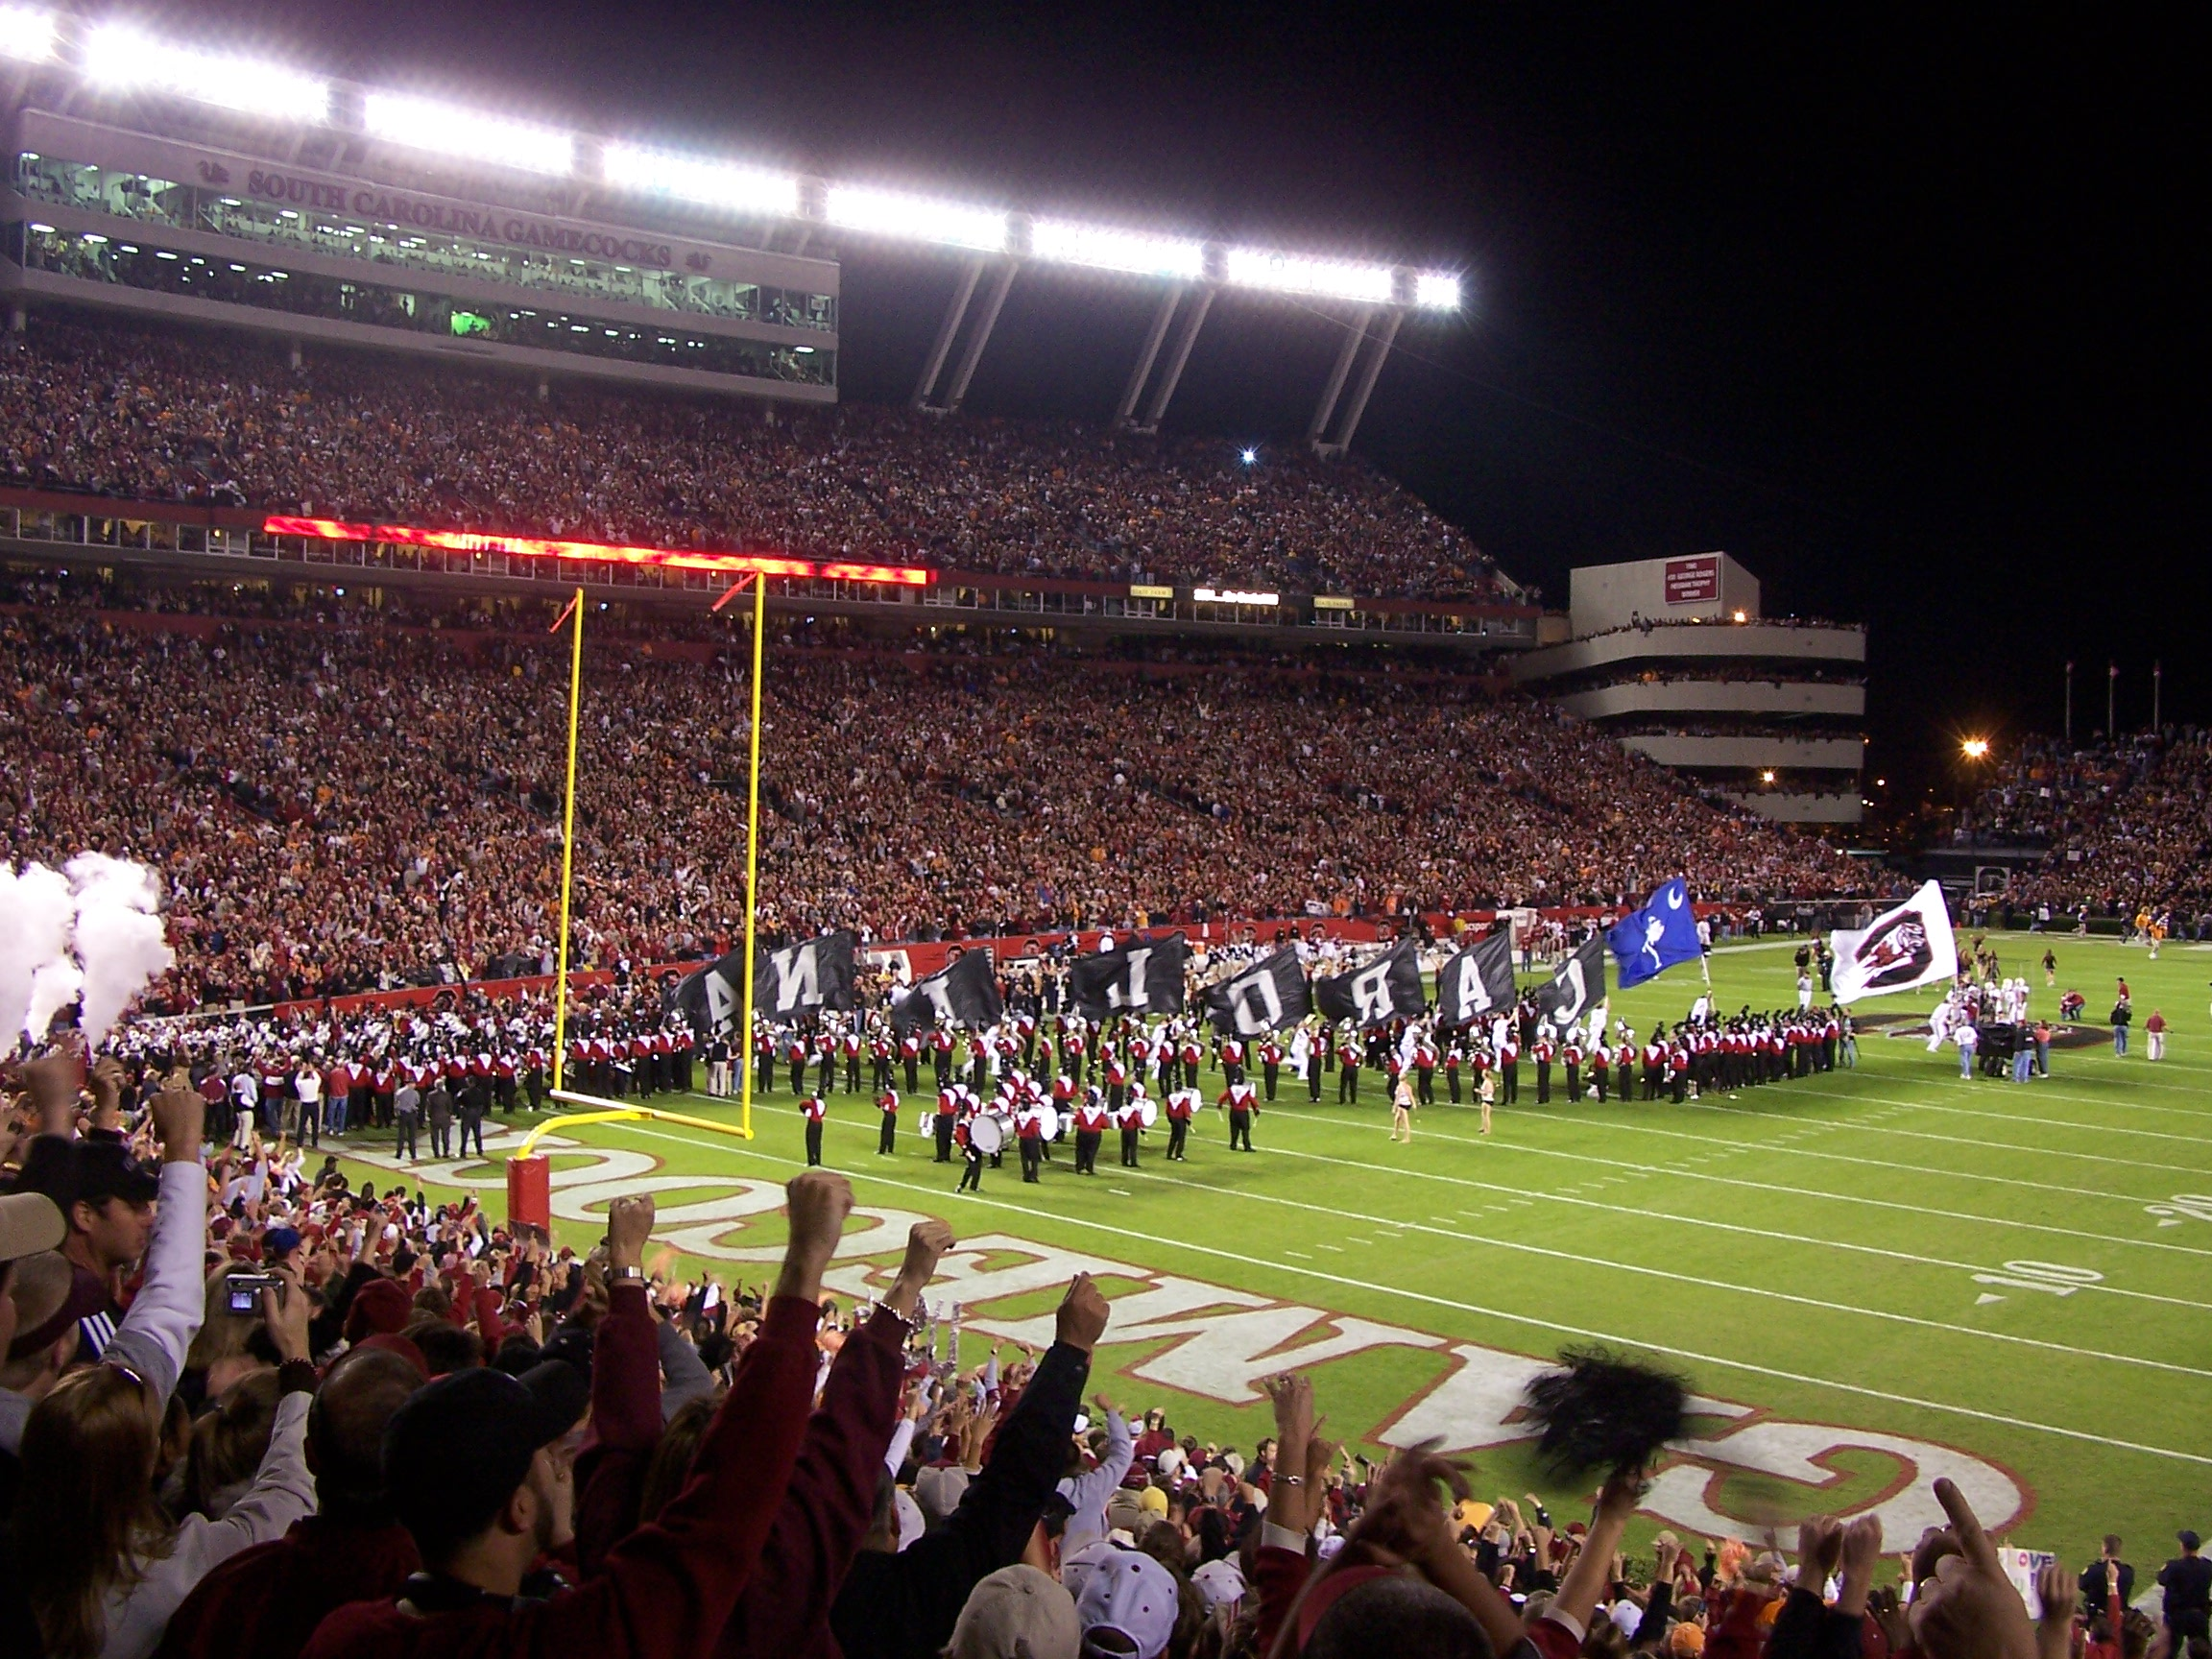 https://i1.wp.com/upload.wikimedia.org/wikipedia/commons/3/38/Williams-Brice_Stadium.jpg